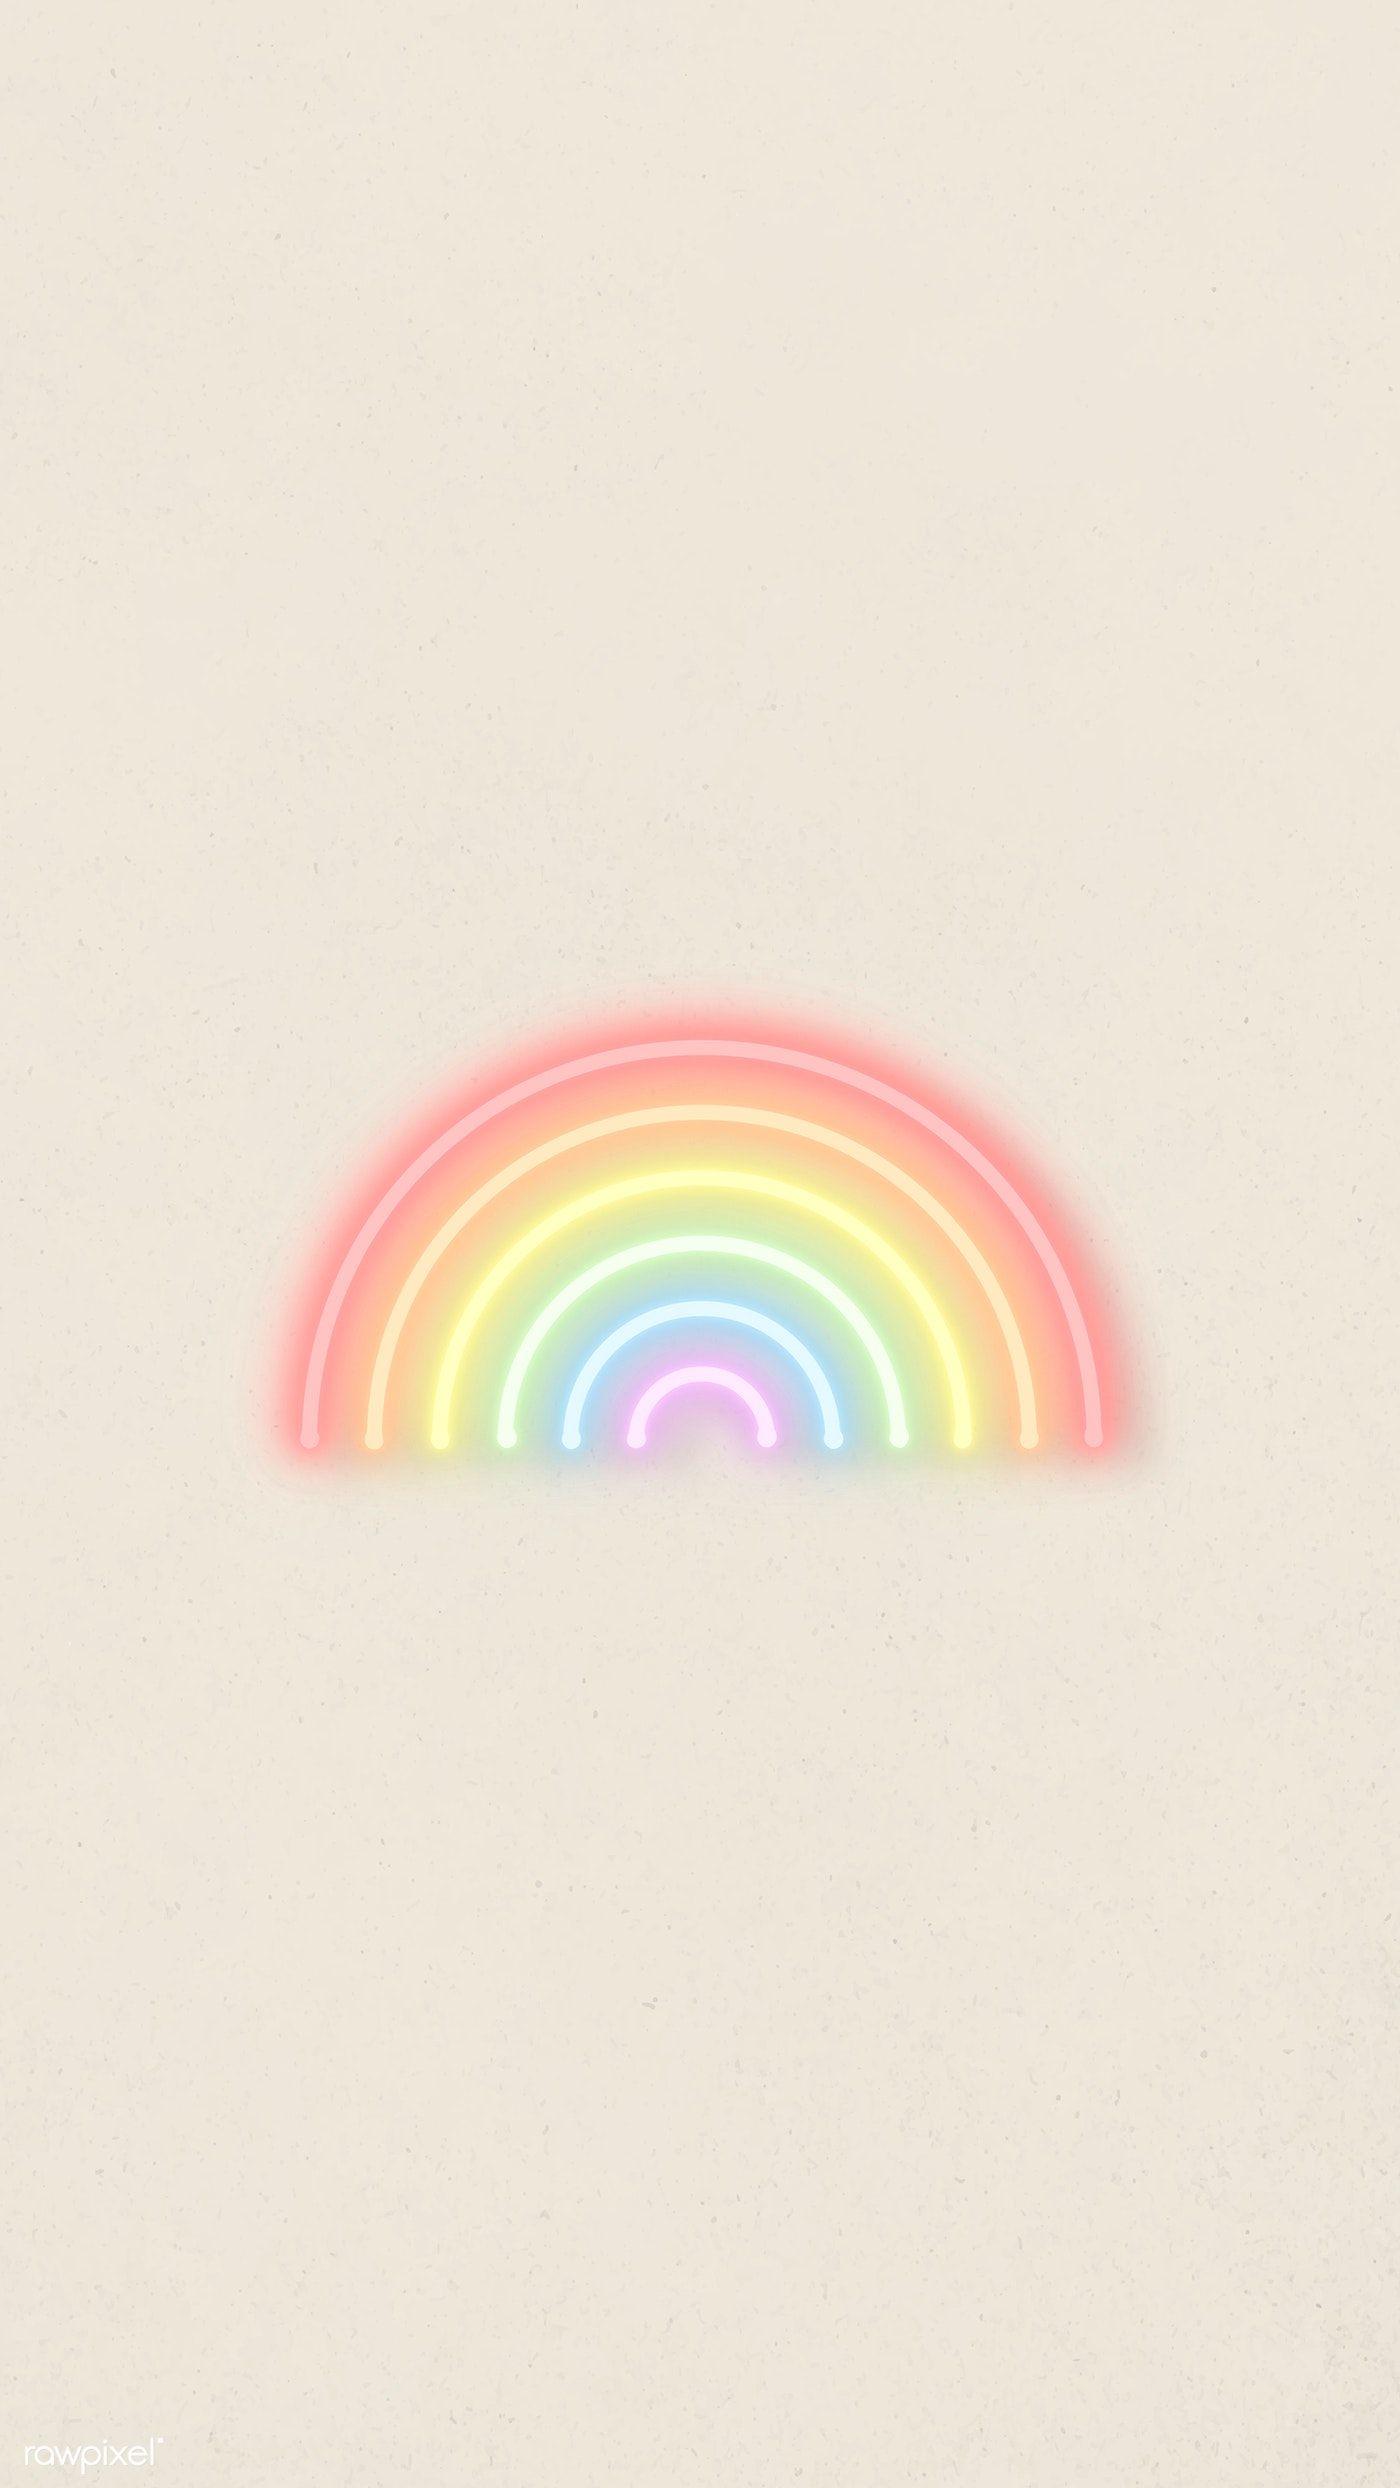 Download Premium Vector Of Rainbow Colors Neon Vector Mobile Phone Rainbow Wallpaper Iphone Rainbow Wallpaper Backgrounds Rainbow Aesthetic